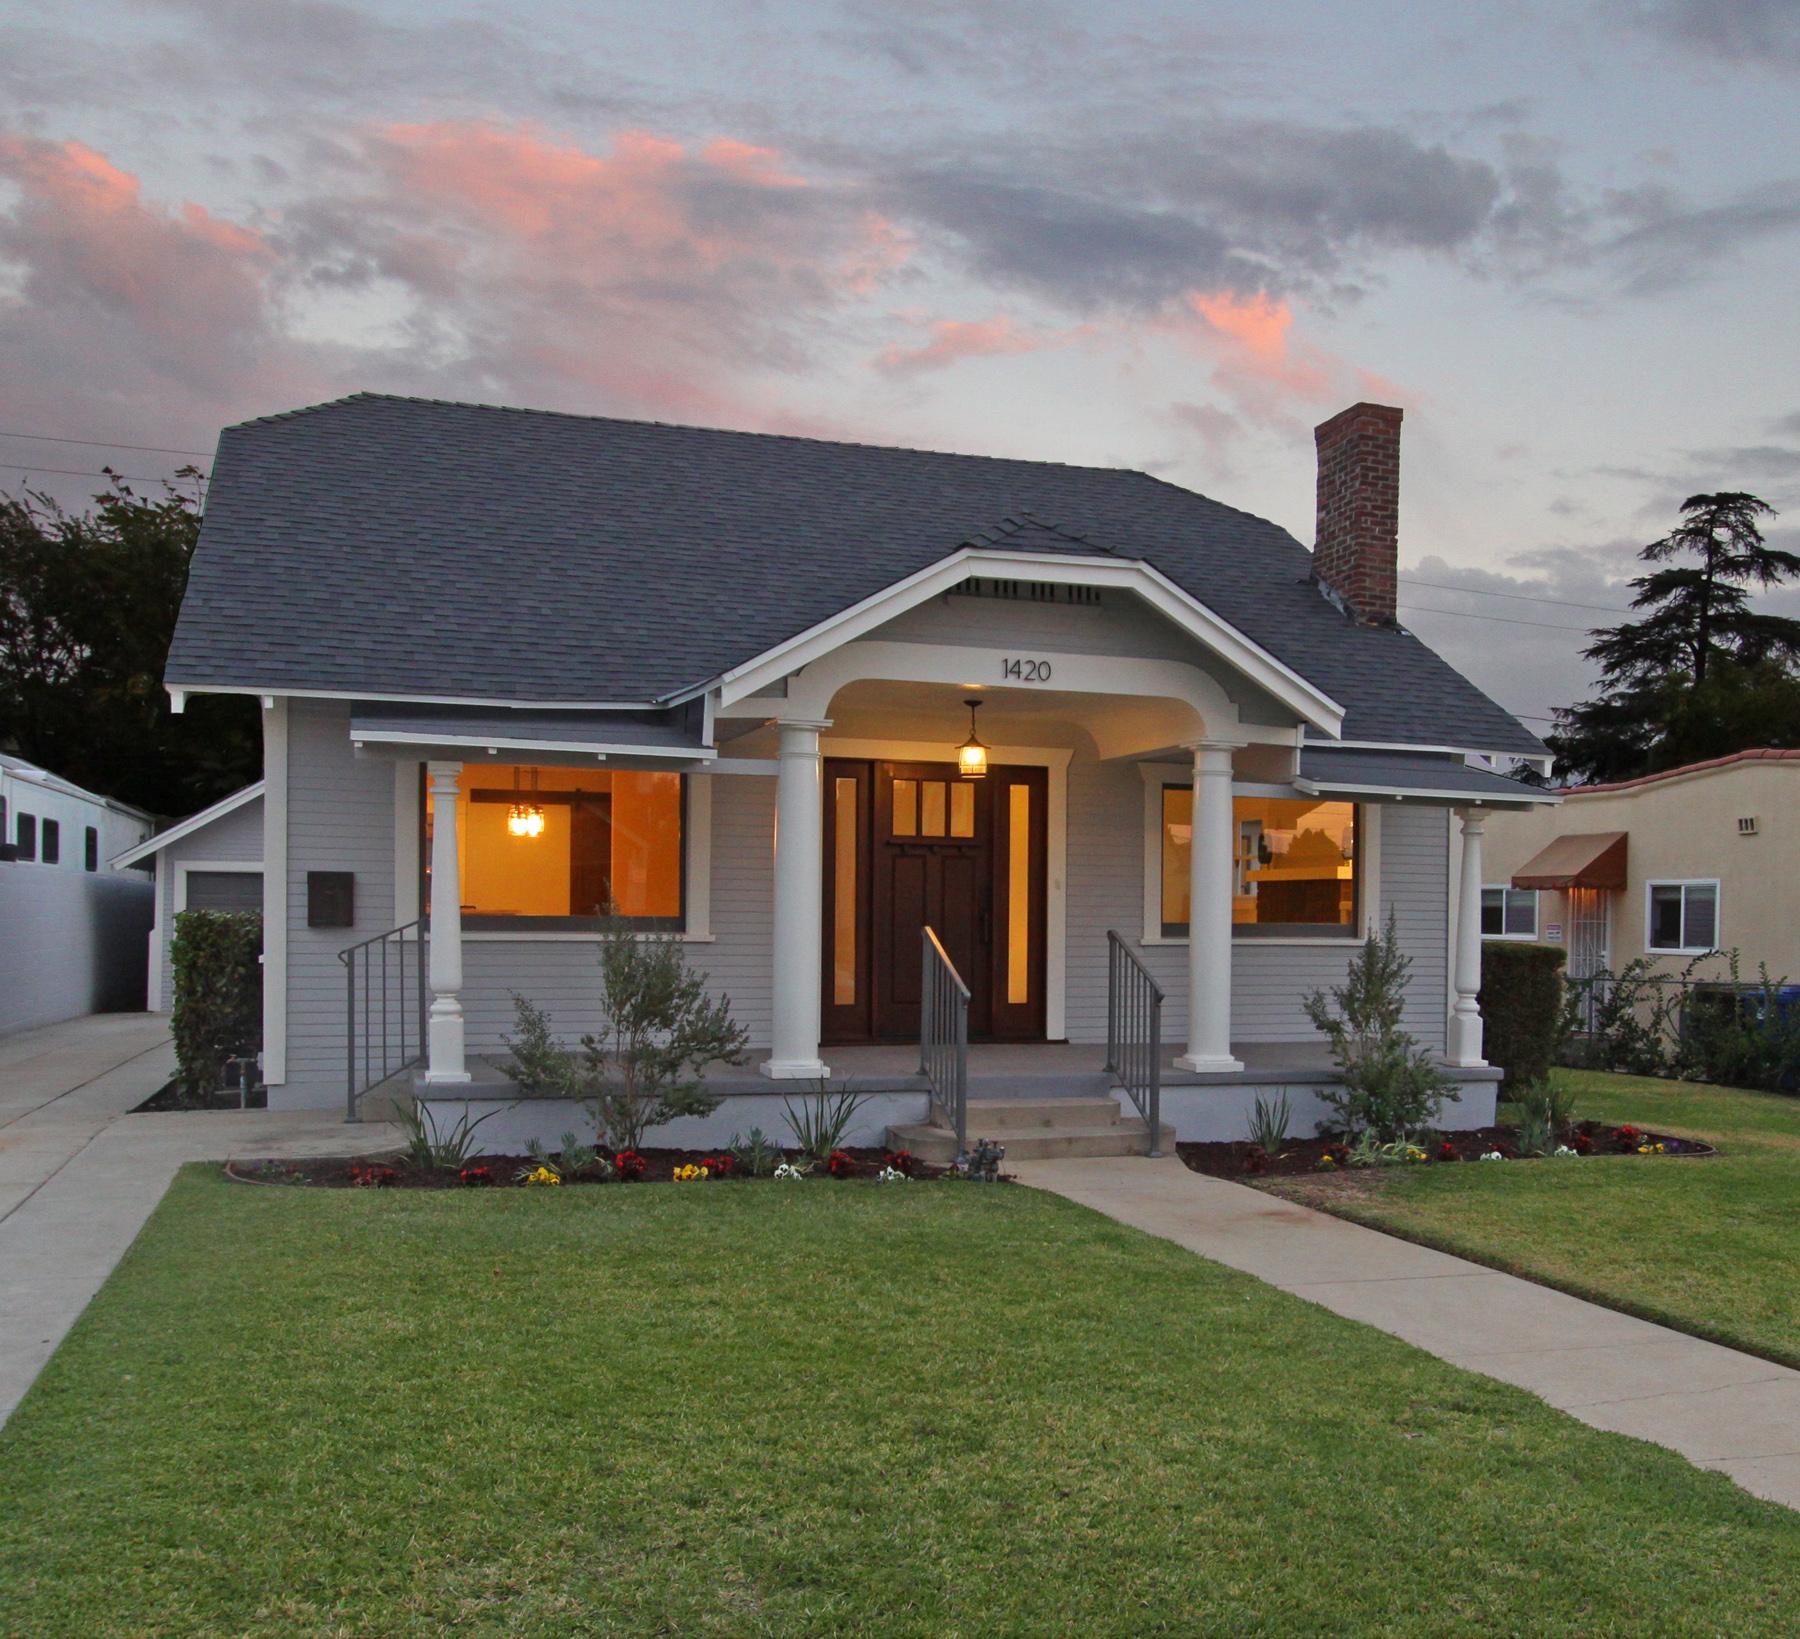 1420 N. Dominion Ave, Pasadena 91104